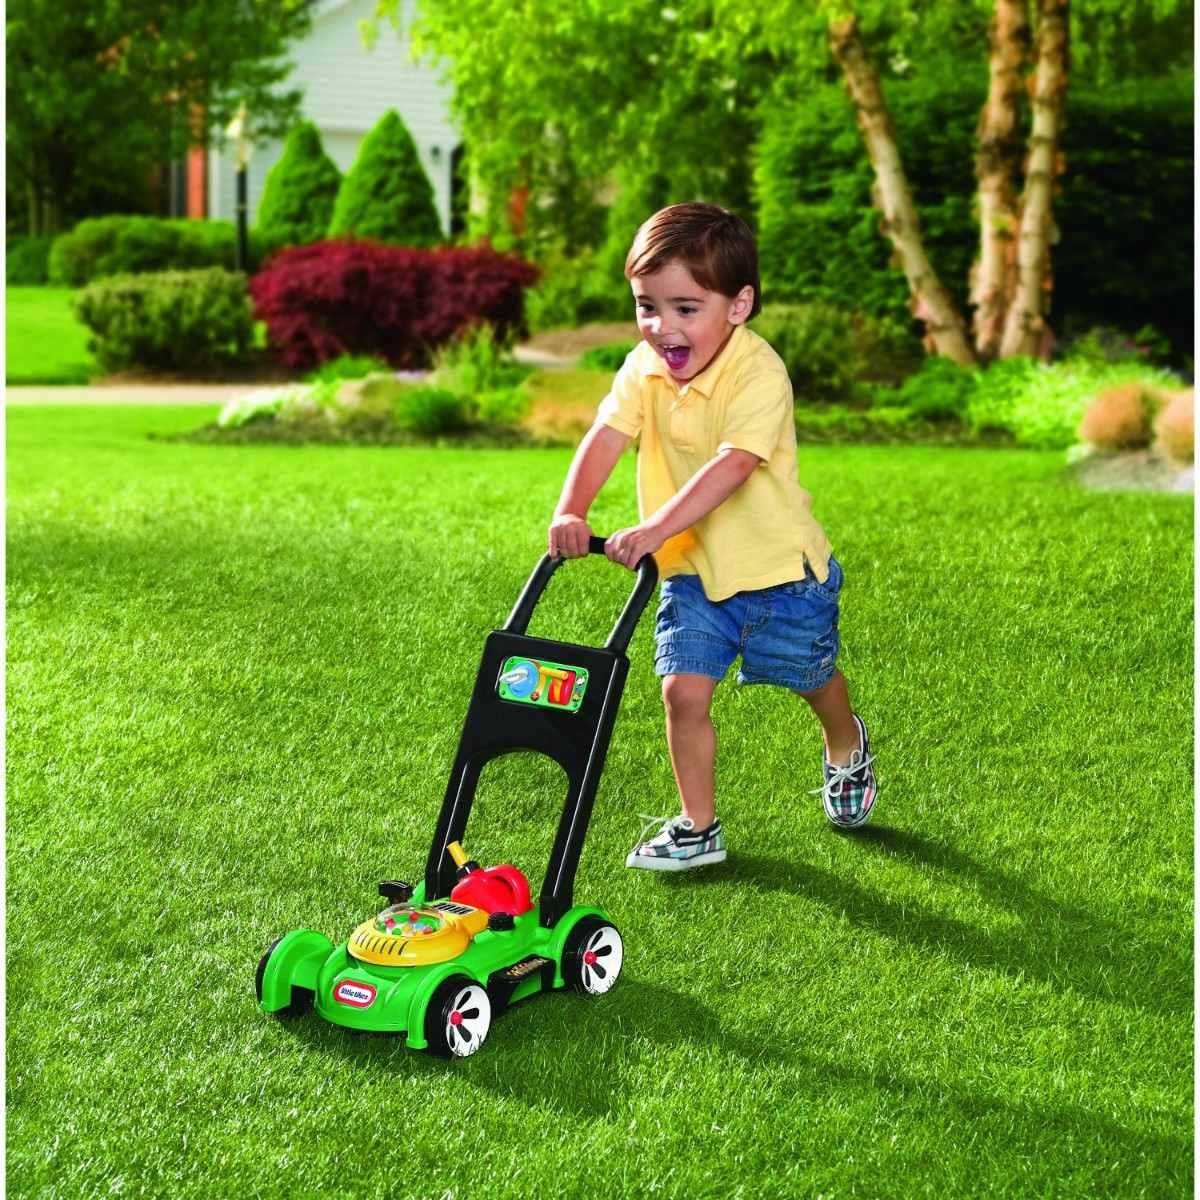 Carrito Podador Mower Infantil Little Tikes 1 260 00